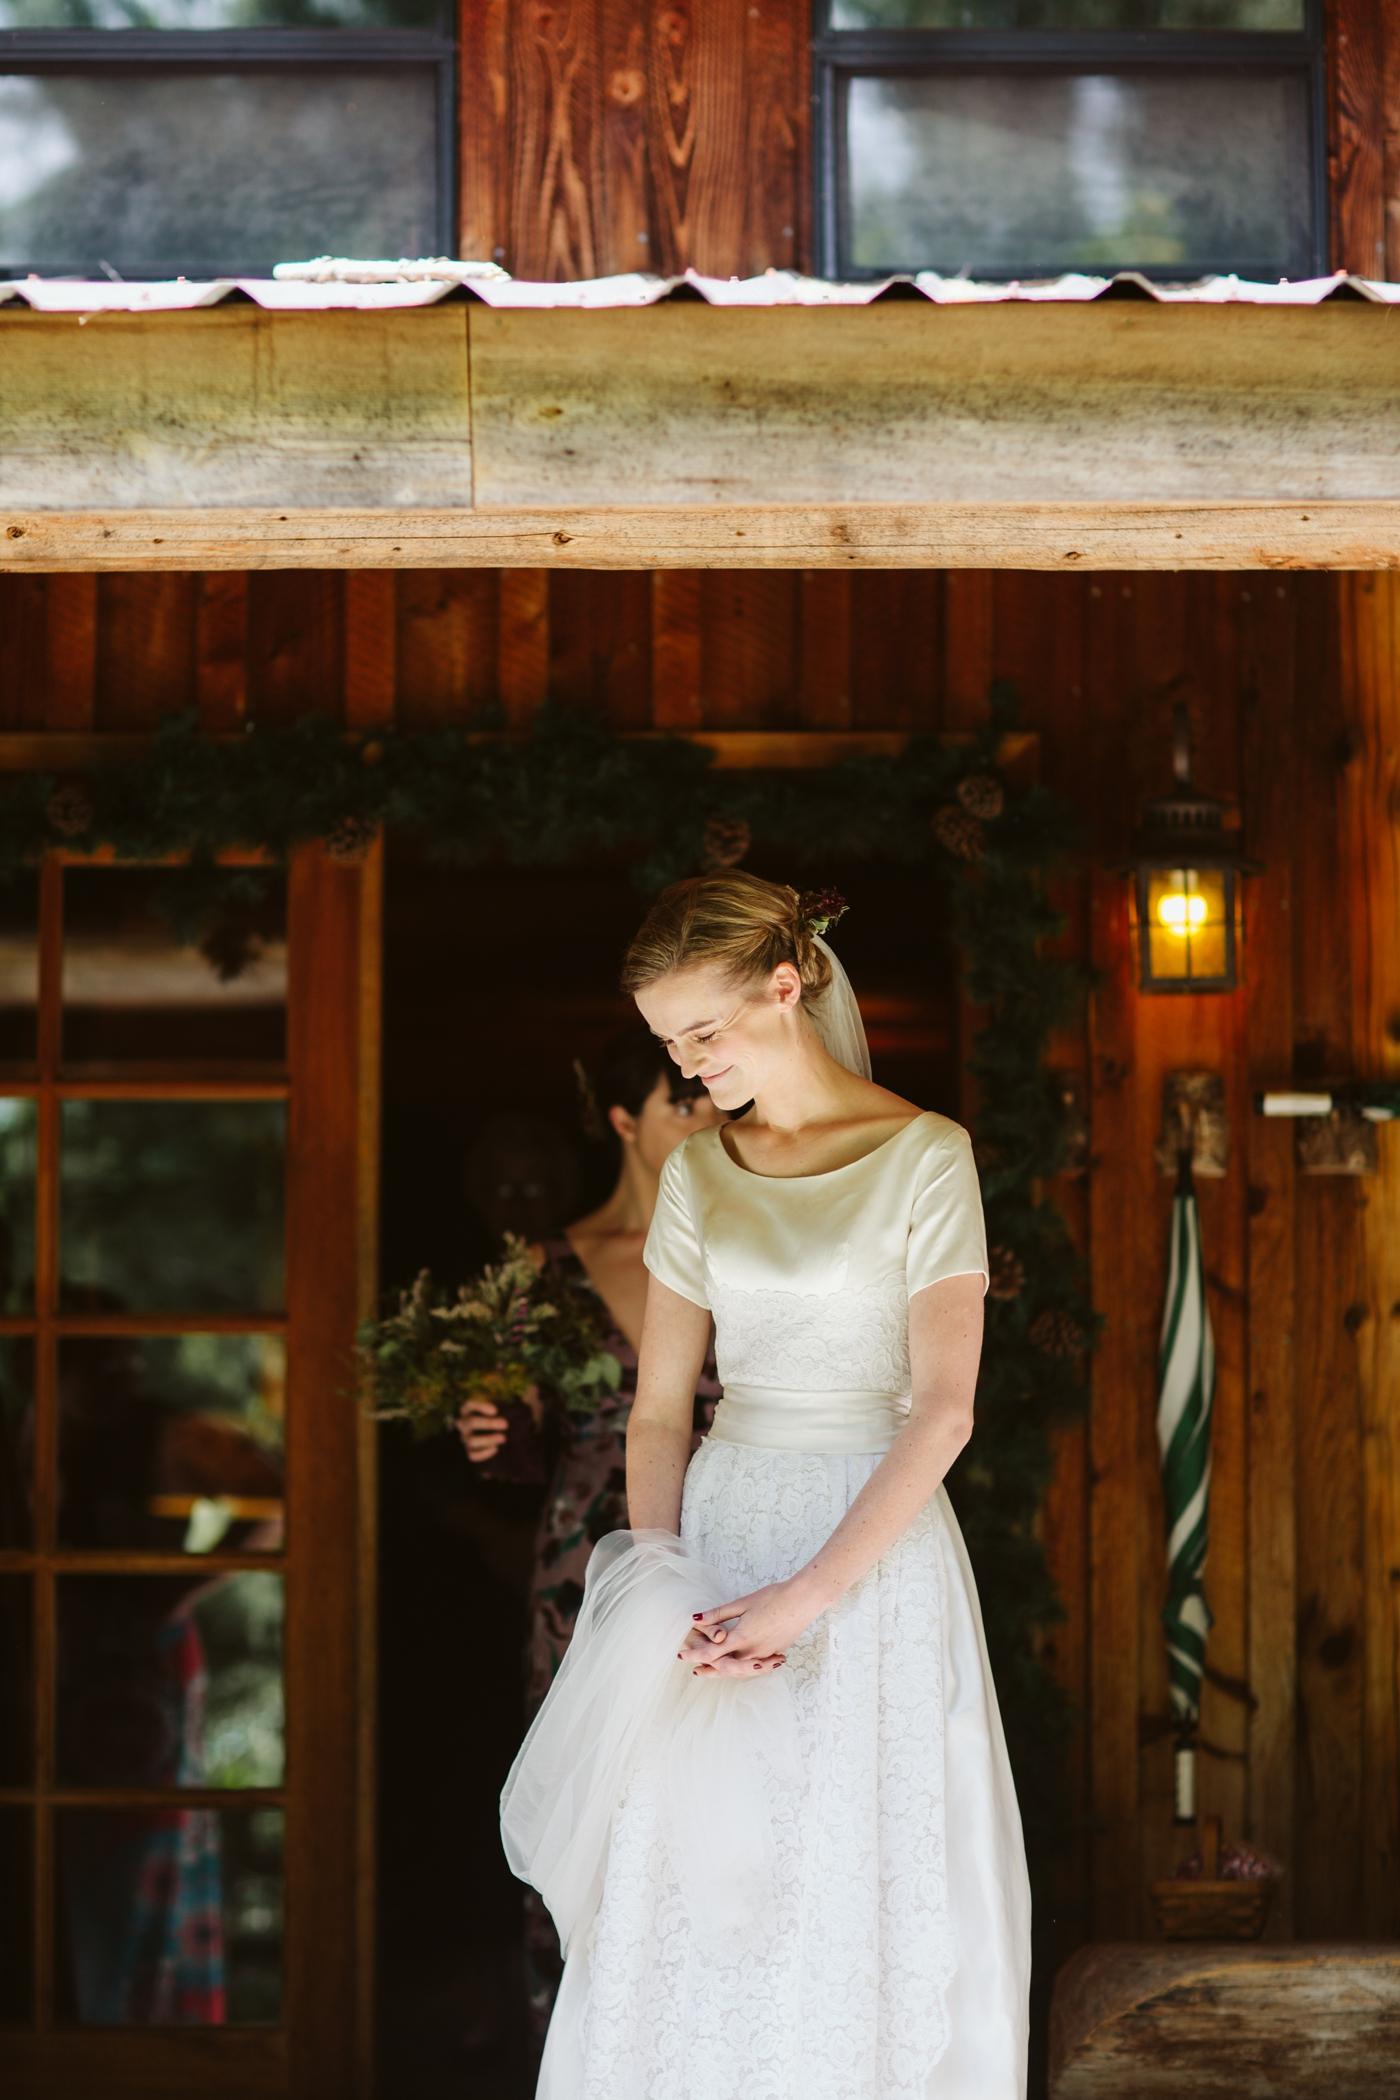 forest-adventure-mountain-top-elopement-photographer-pnw-seattle-washington-wedding-engagement-hike-photography-alaska-anchorage-dutch-harbor-northcascades-mtrainier-pnw-catie-bergman-pacific-northwest-_0128.jpg